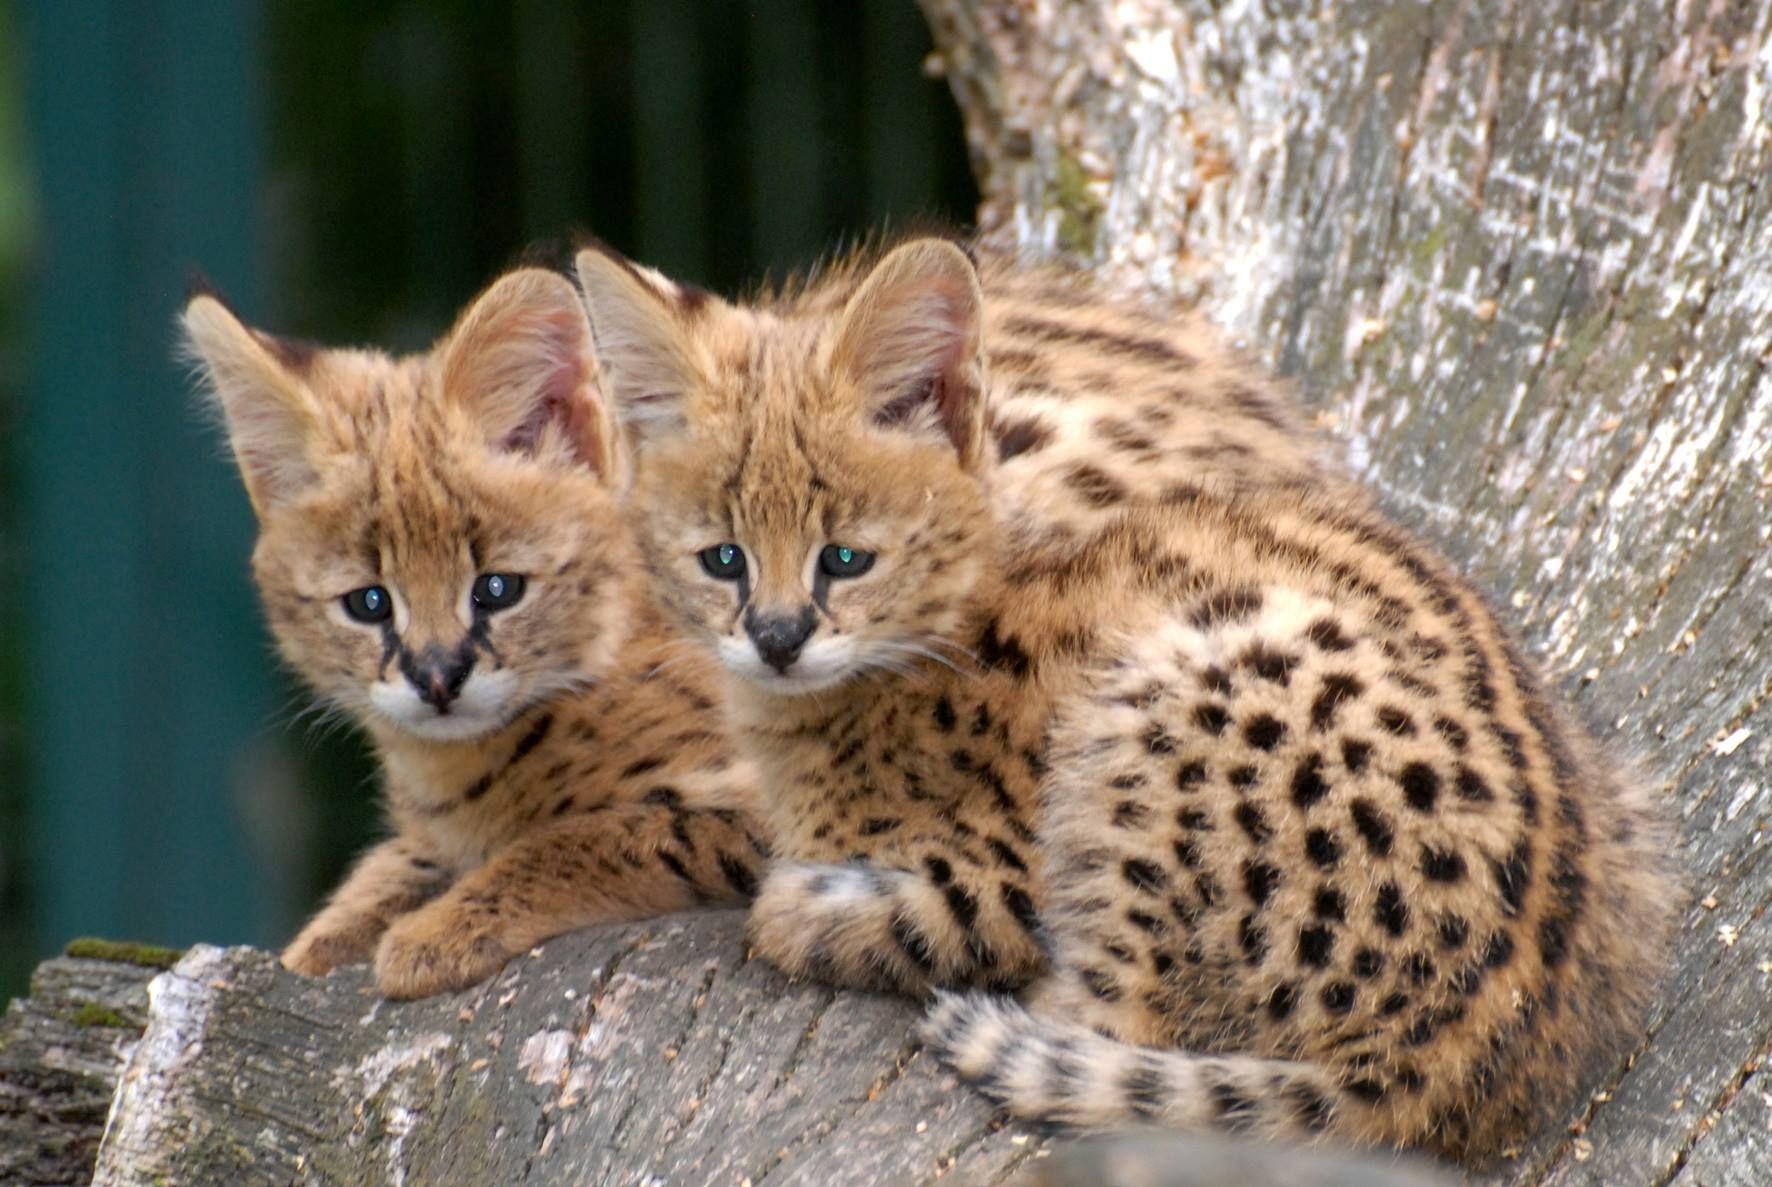 Inbreeding In Big Cats